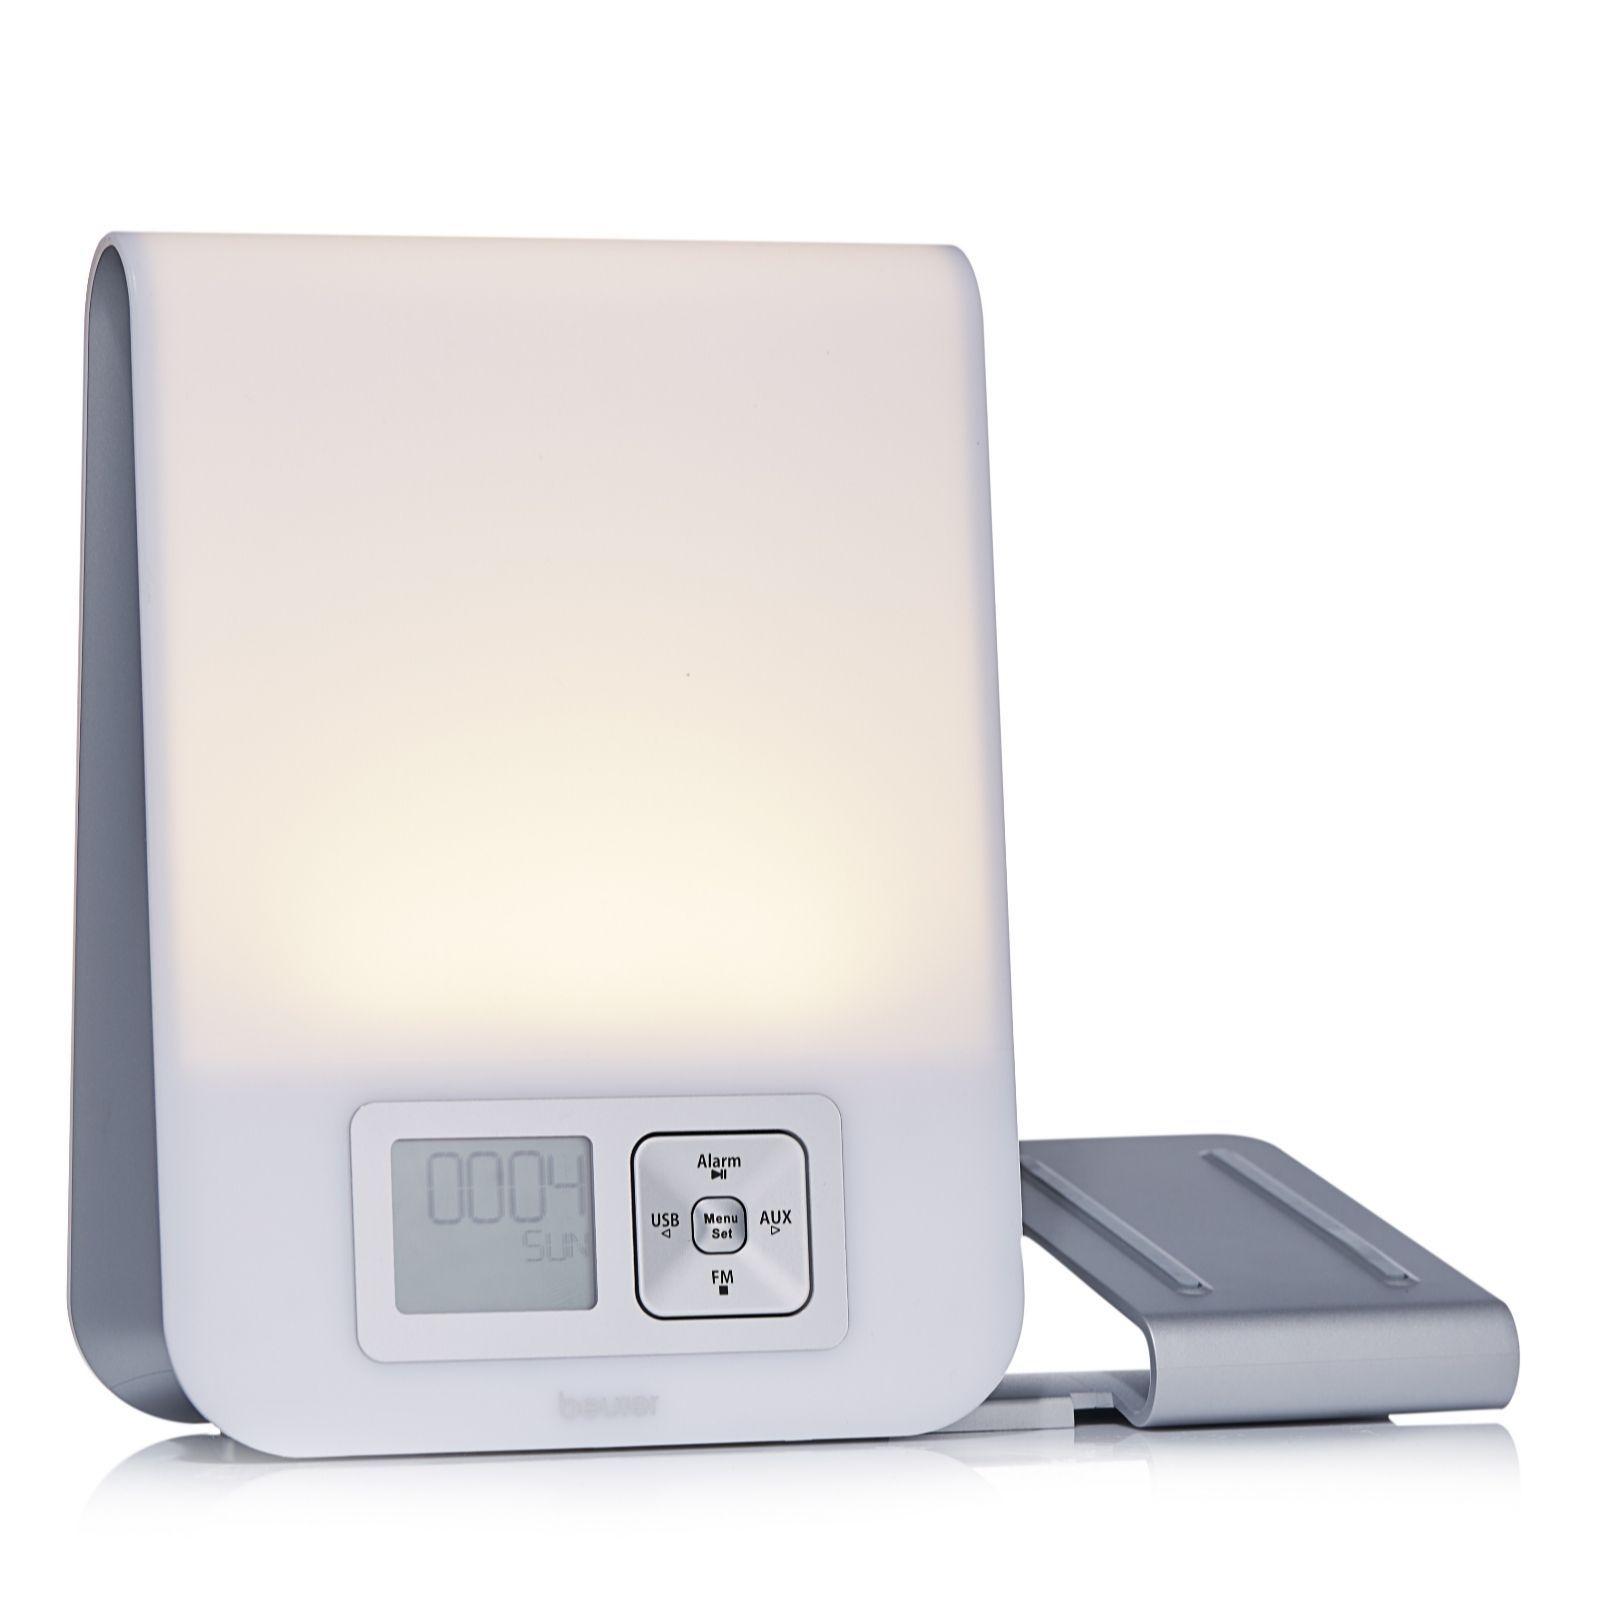 beurer bright light alarm clock qvc price 83 00 geezone rh pinterest com